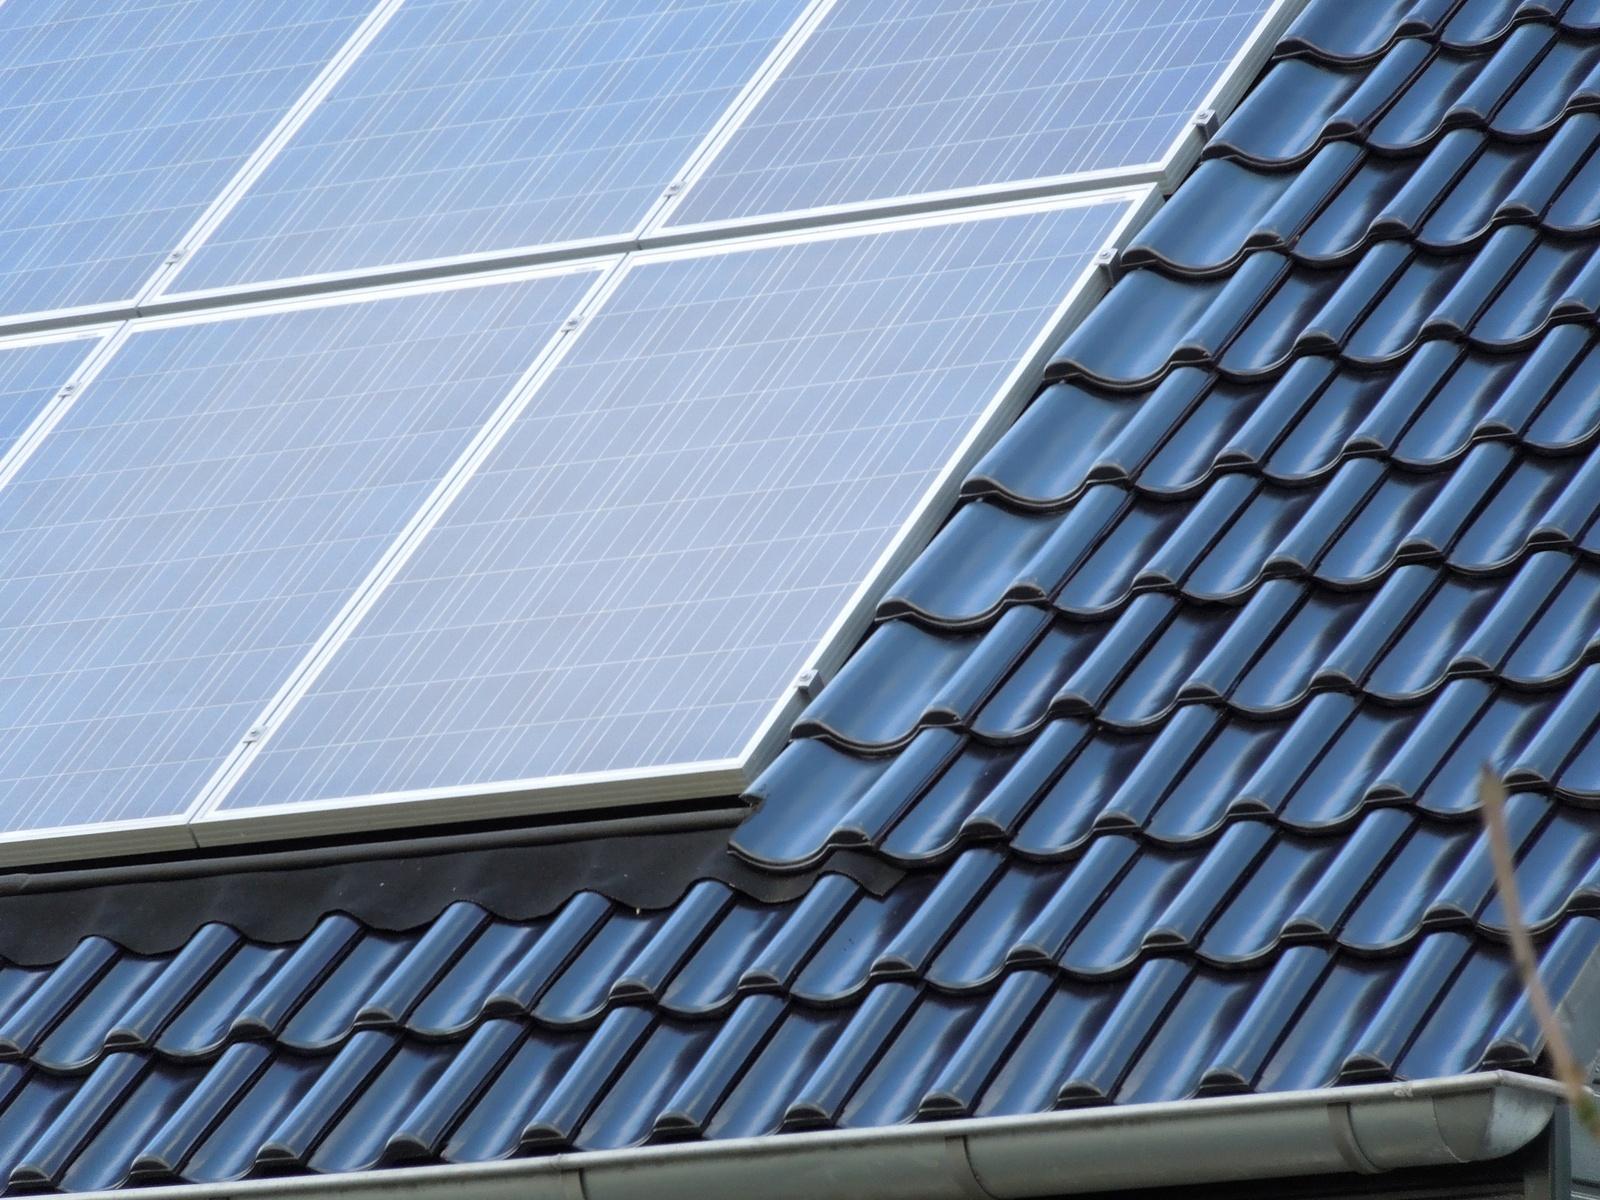 pv panelen in dak weggewerkt